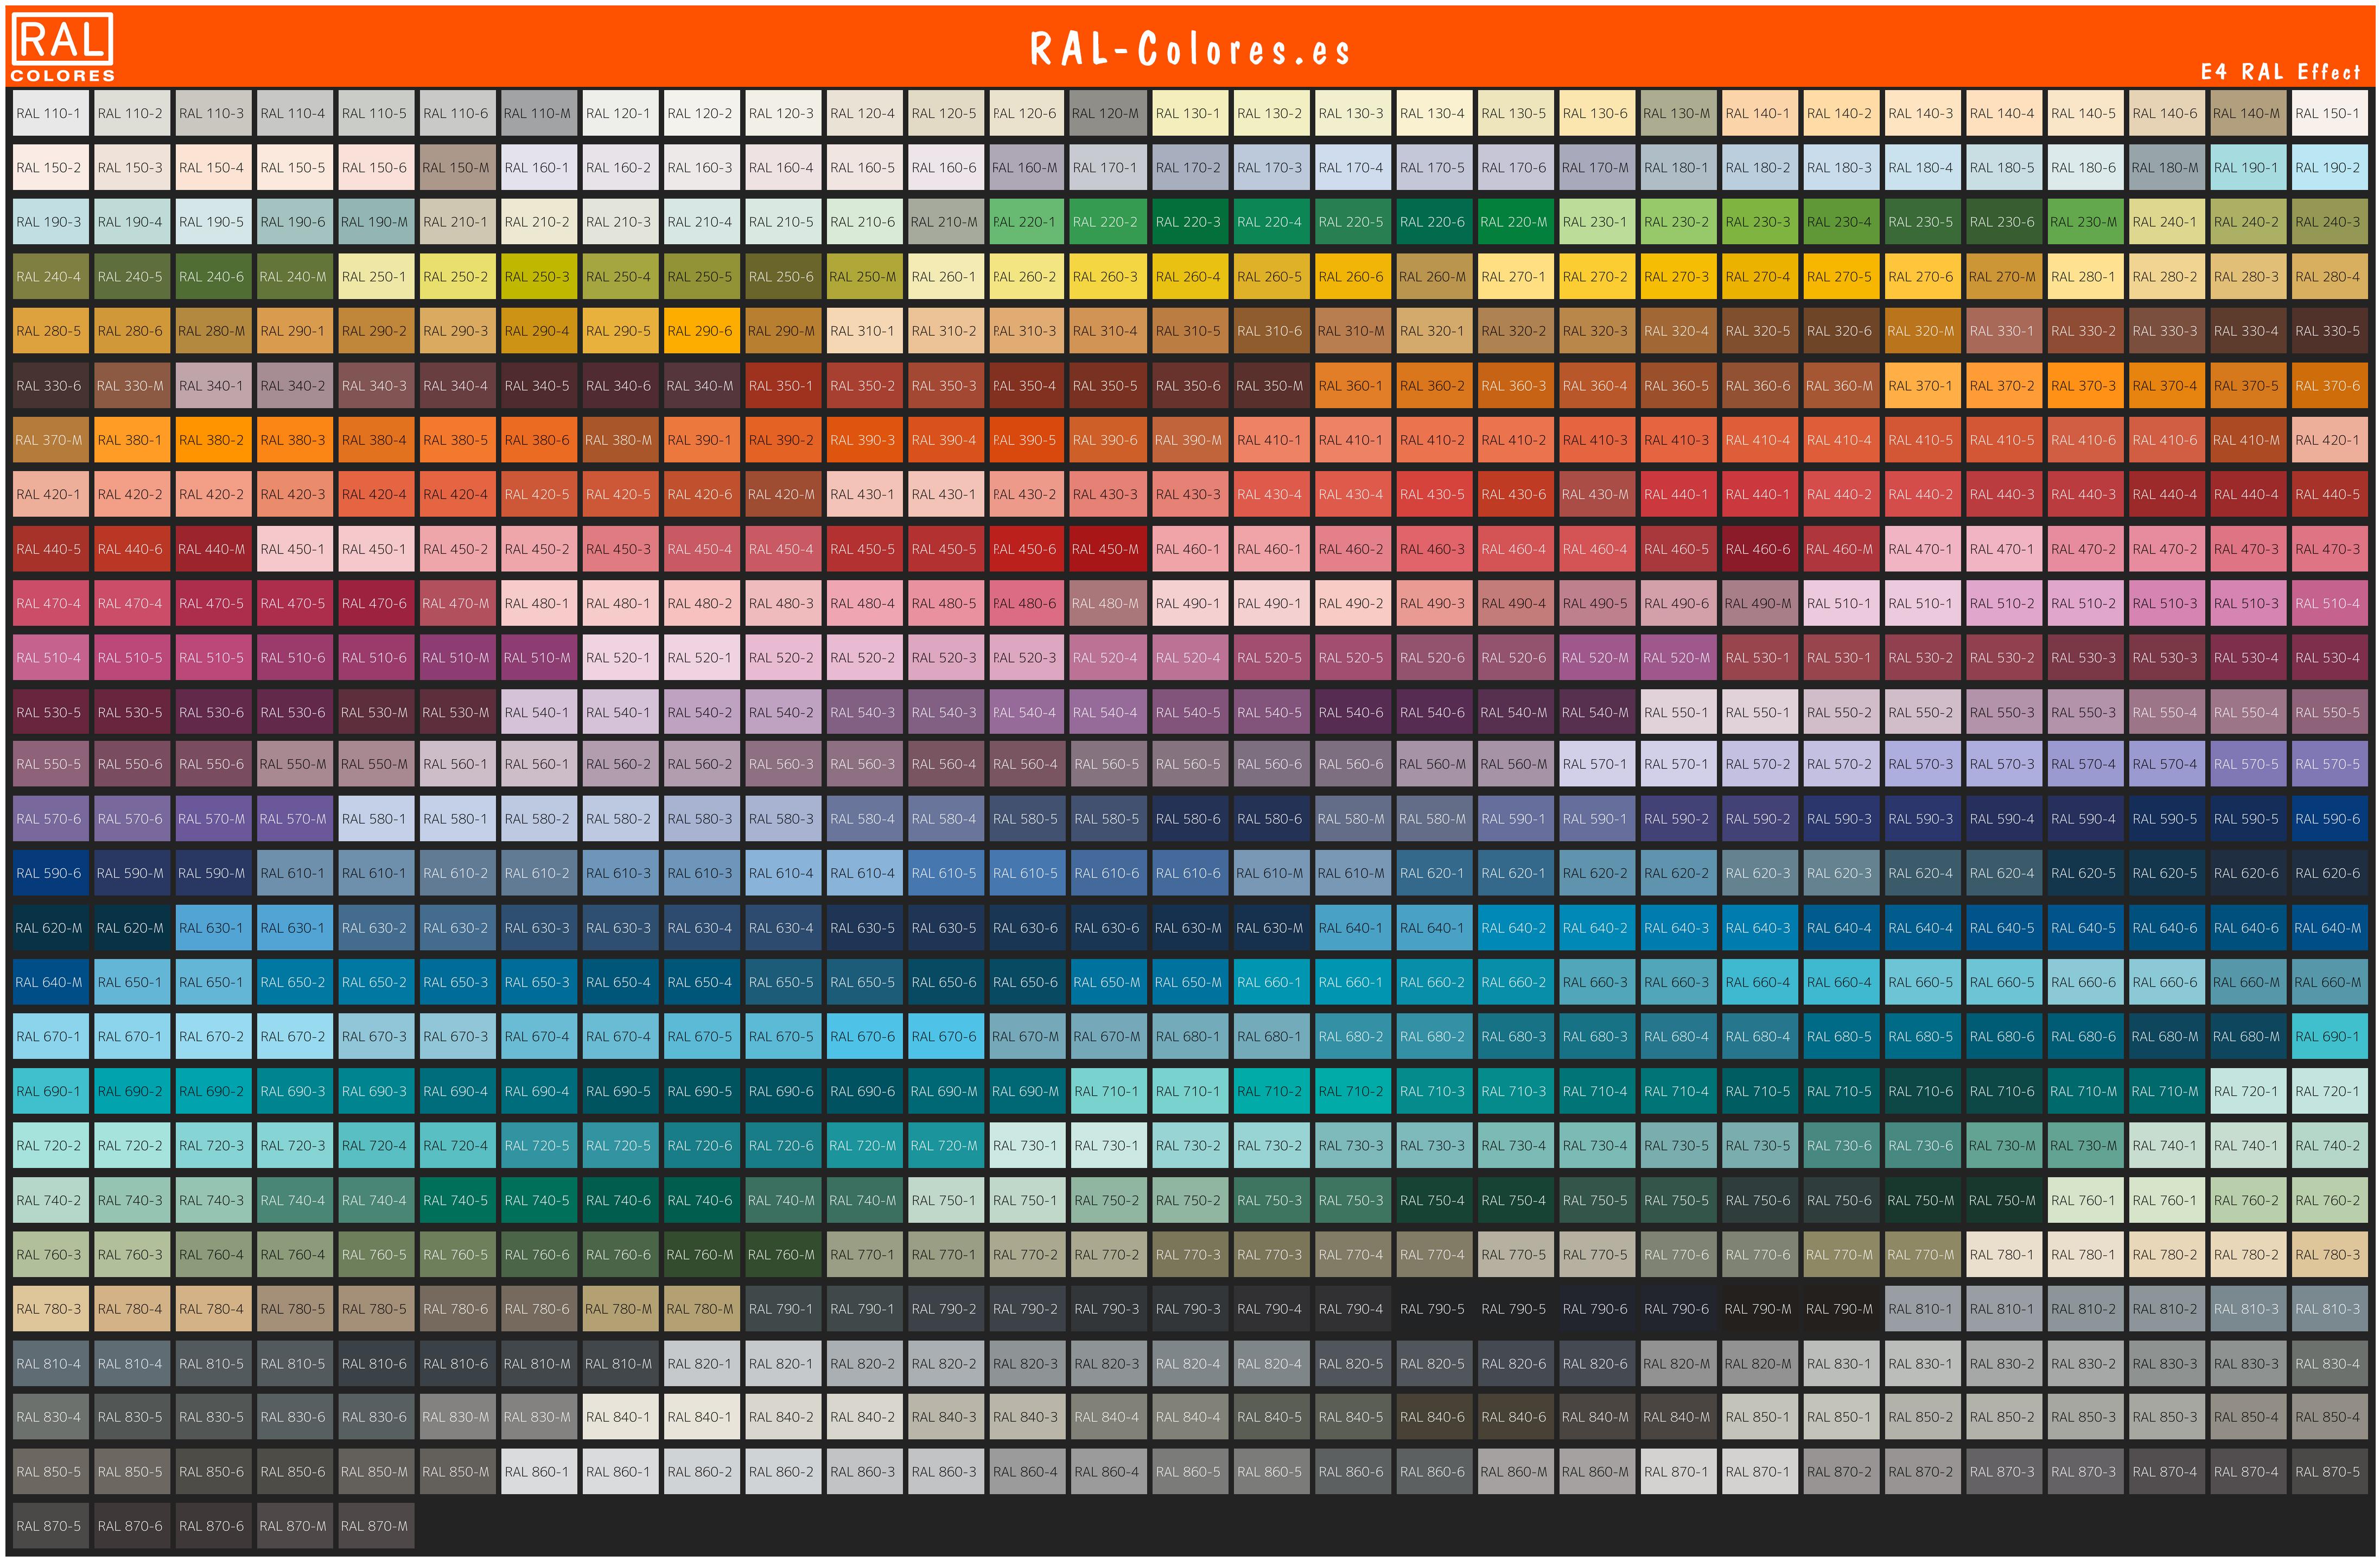 Carta de colores RAL Effect